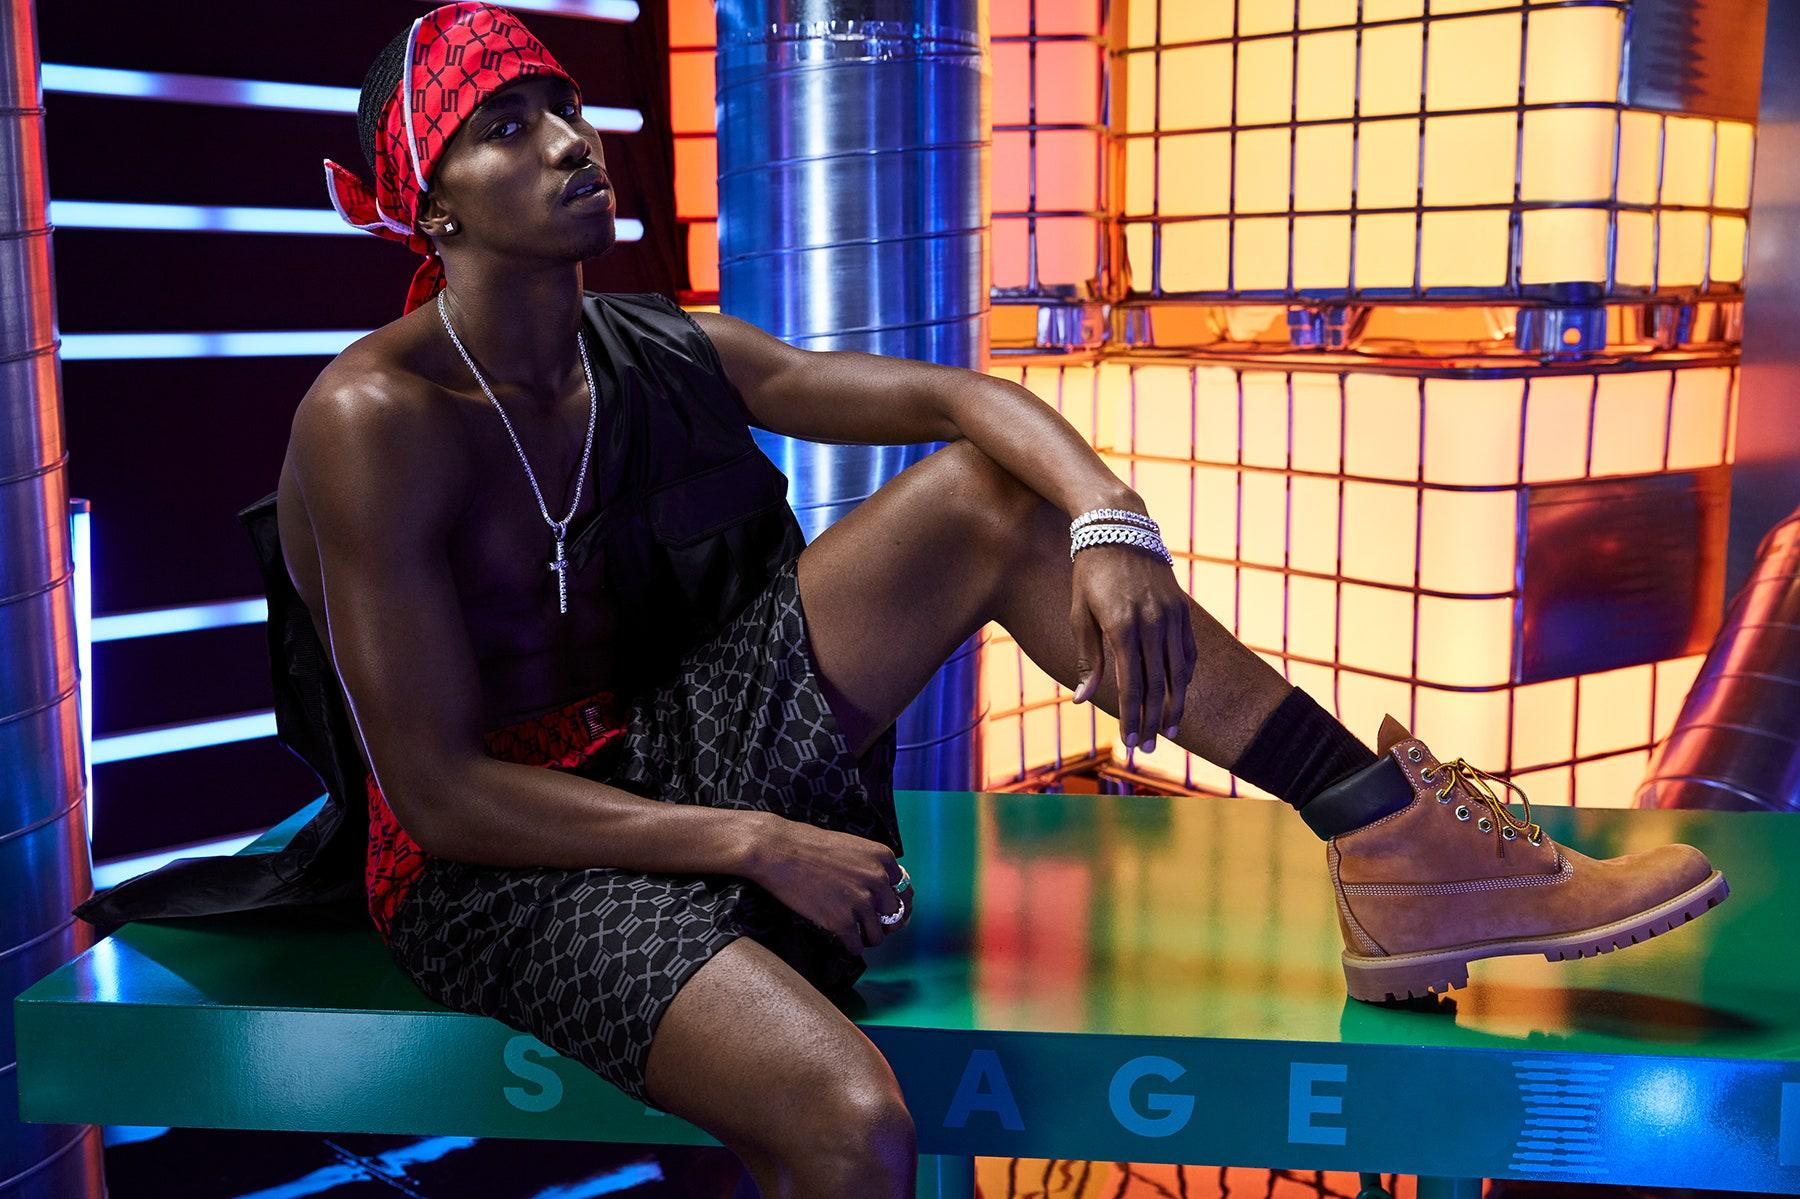 Rihanna Savage X Fenty, mannen, christian combs